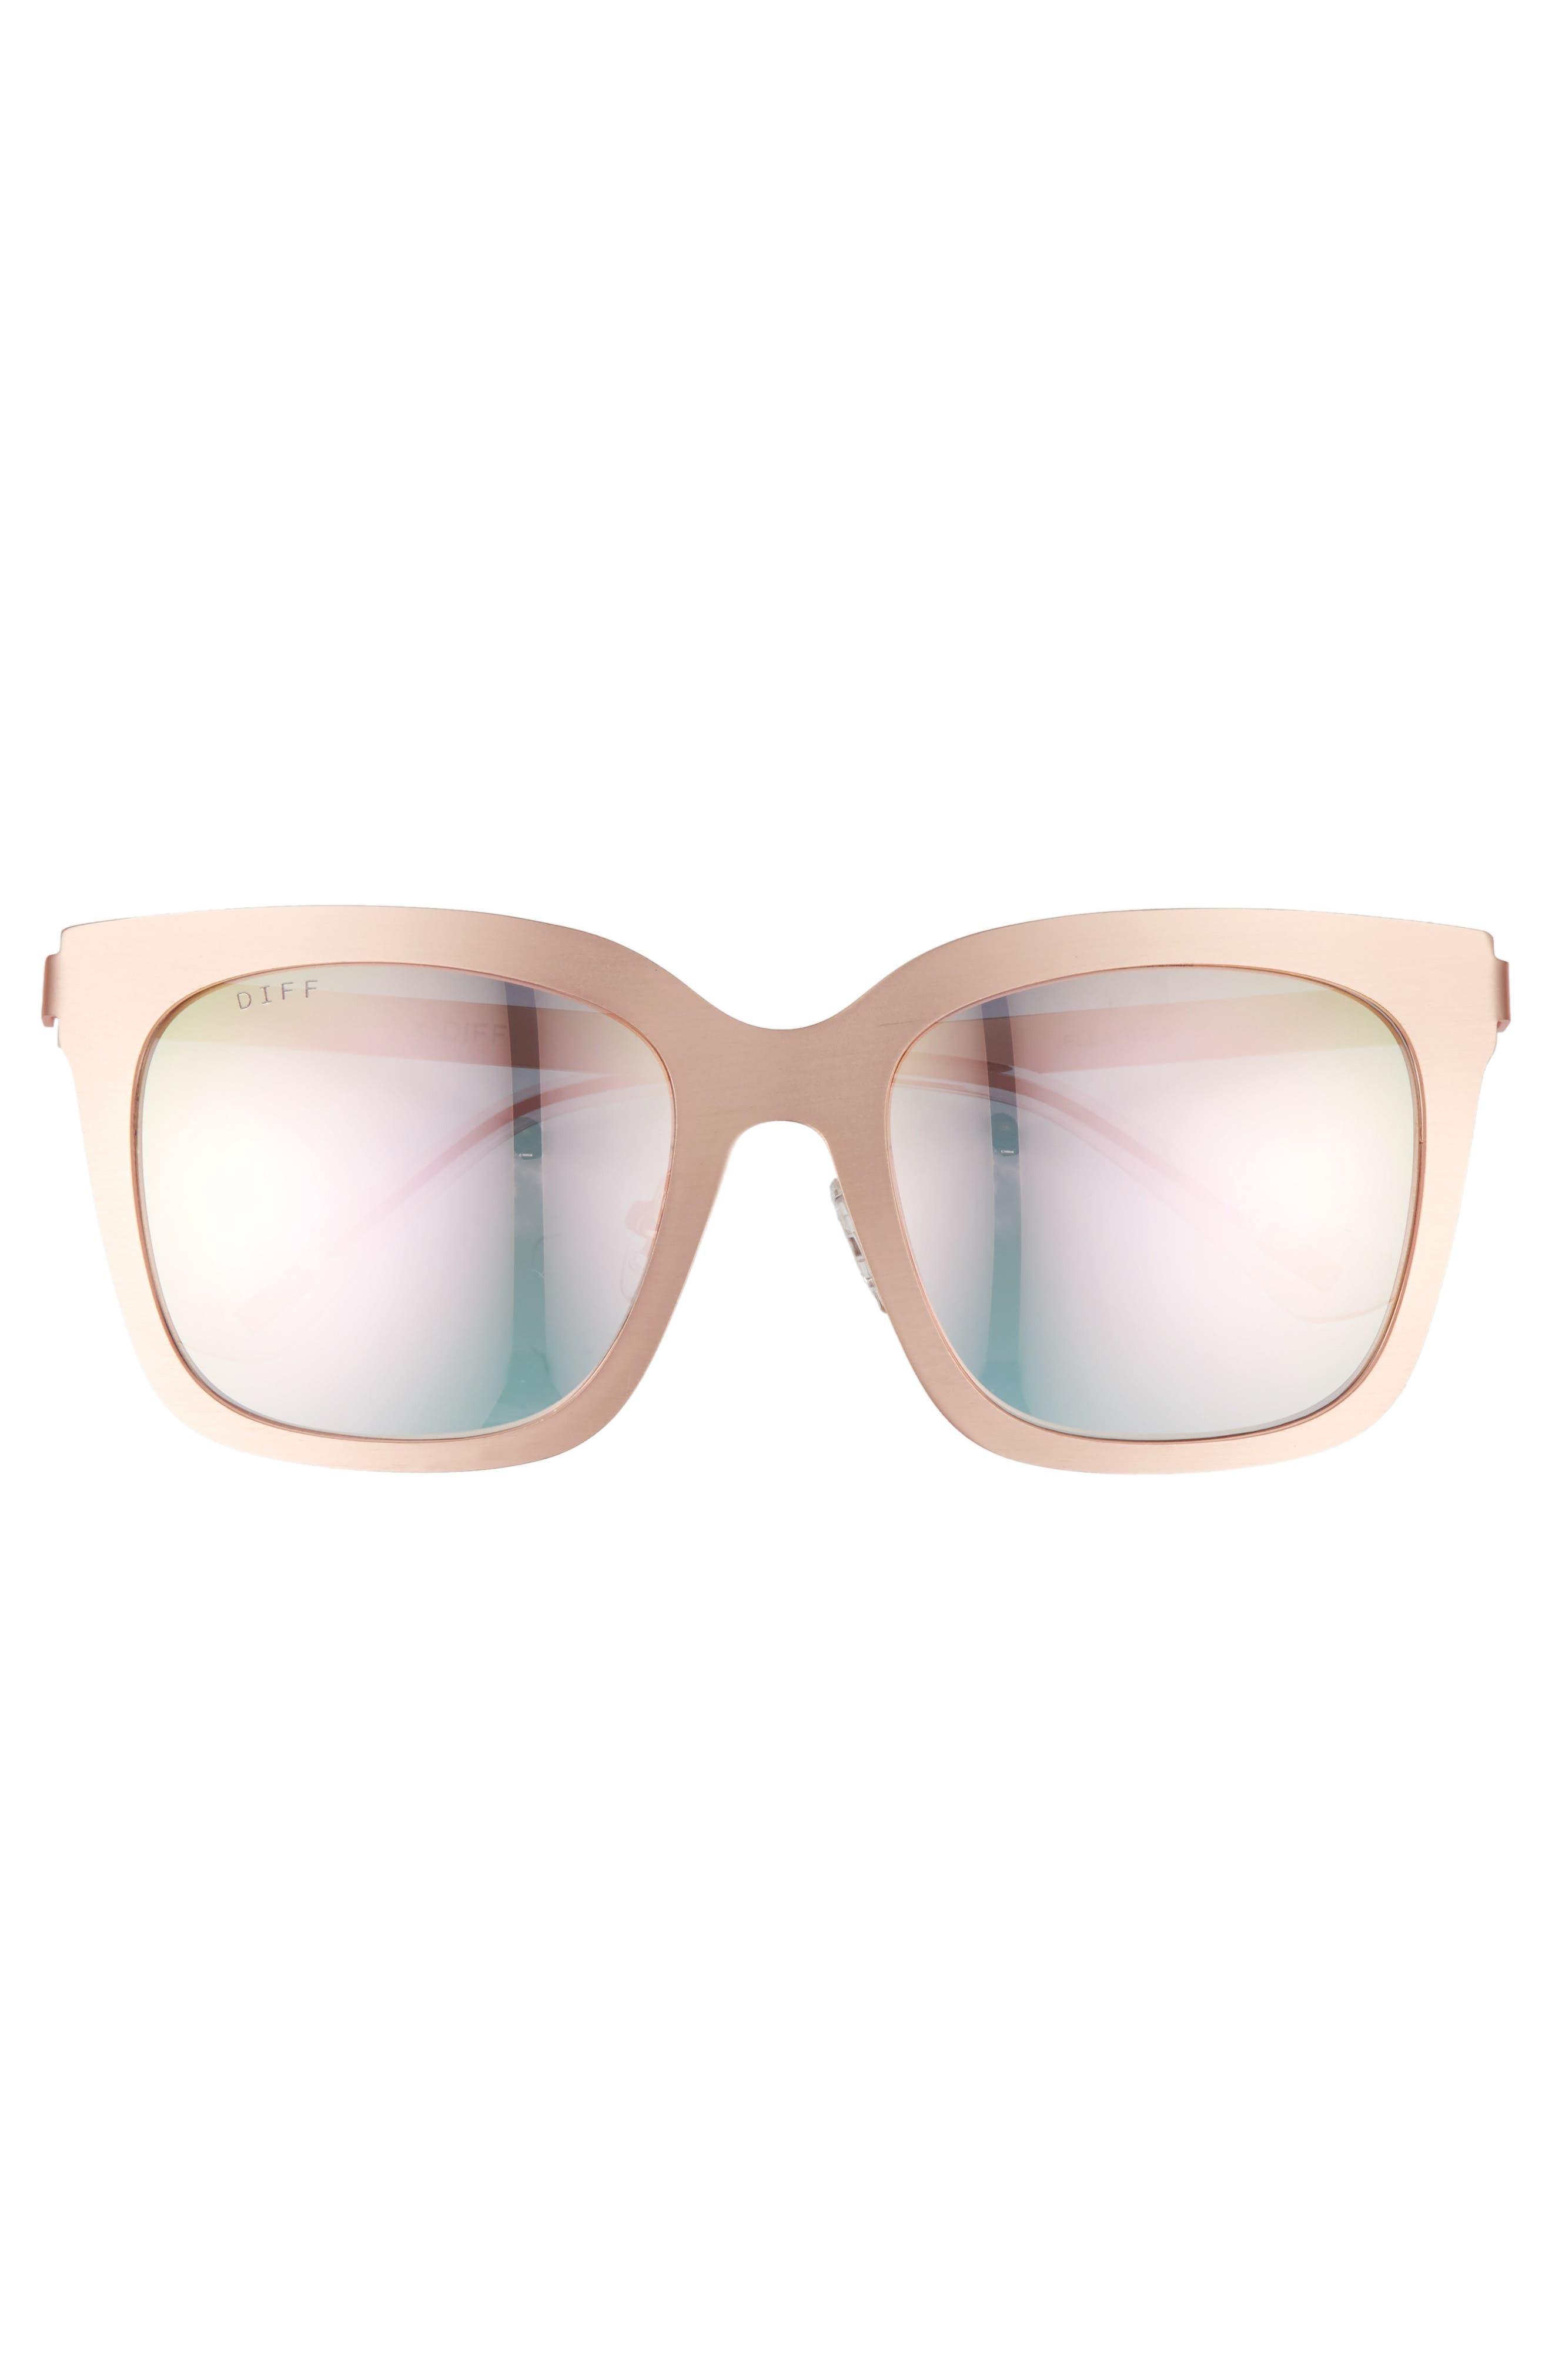 x Lauren Akins Ella 53mm Sunglasses,                             Alternate thumbnail 4, color,                             Rose Gold/ Pink